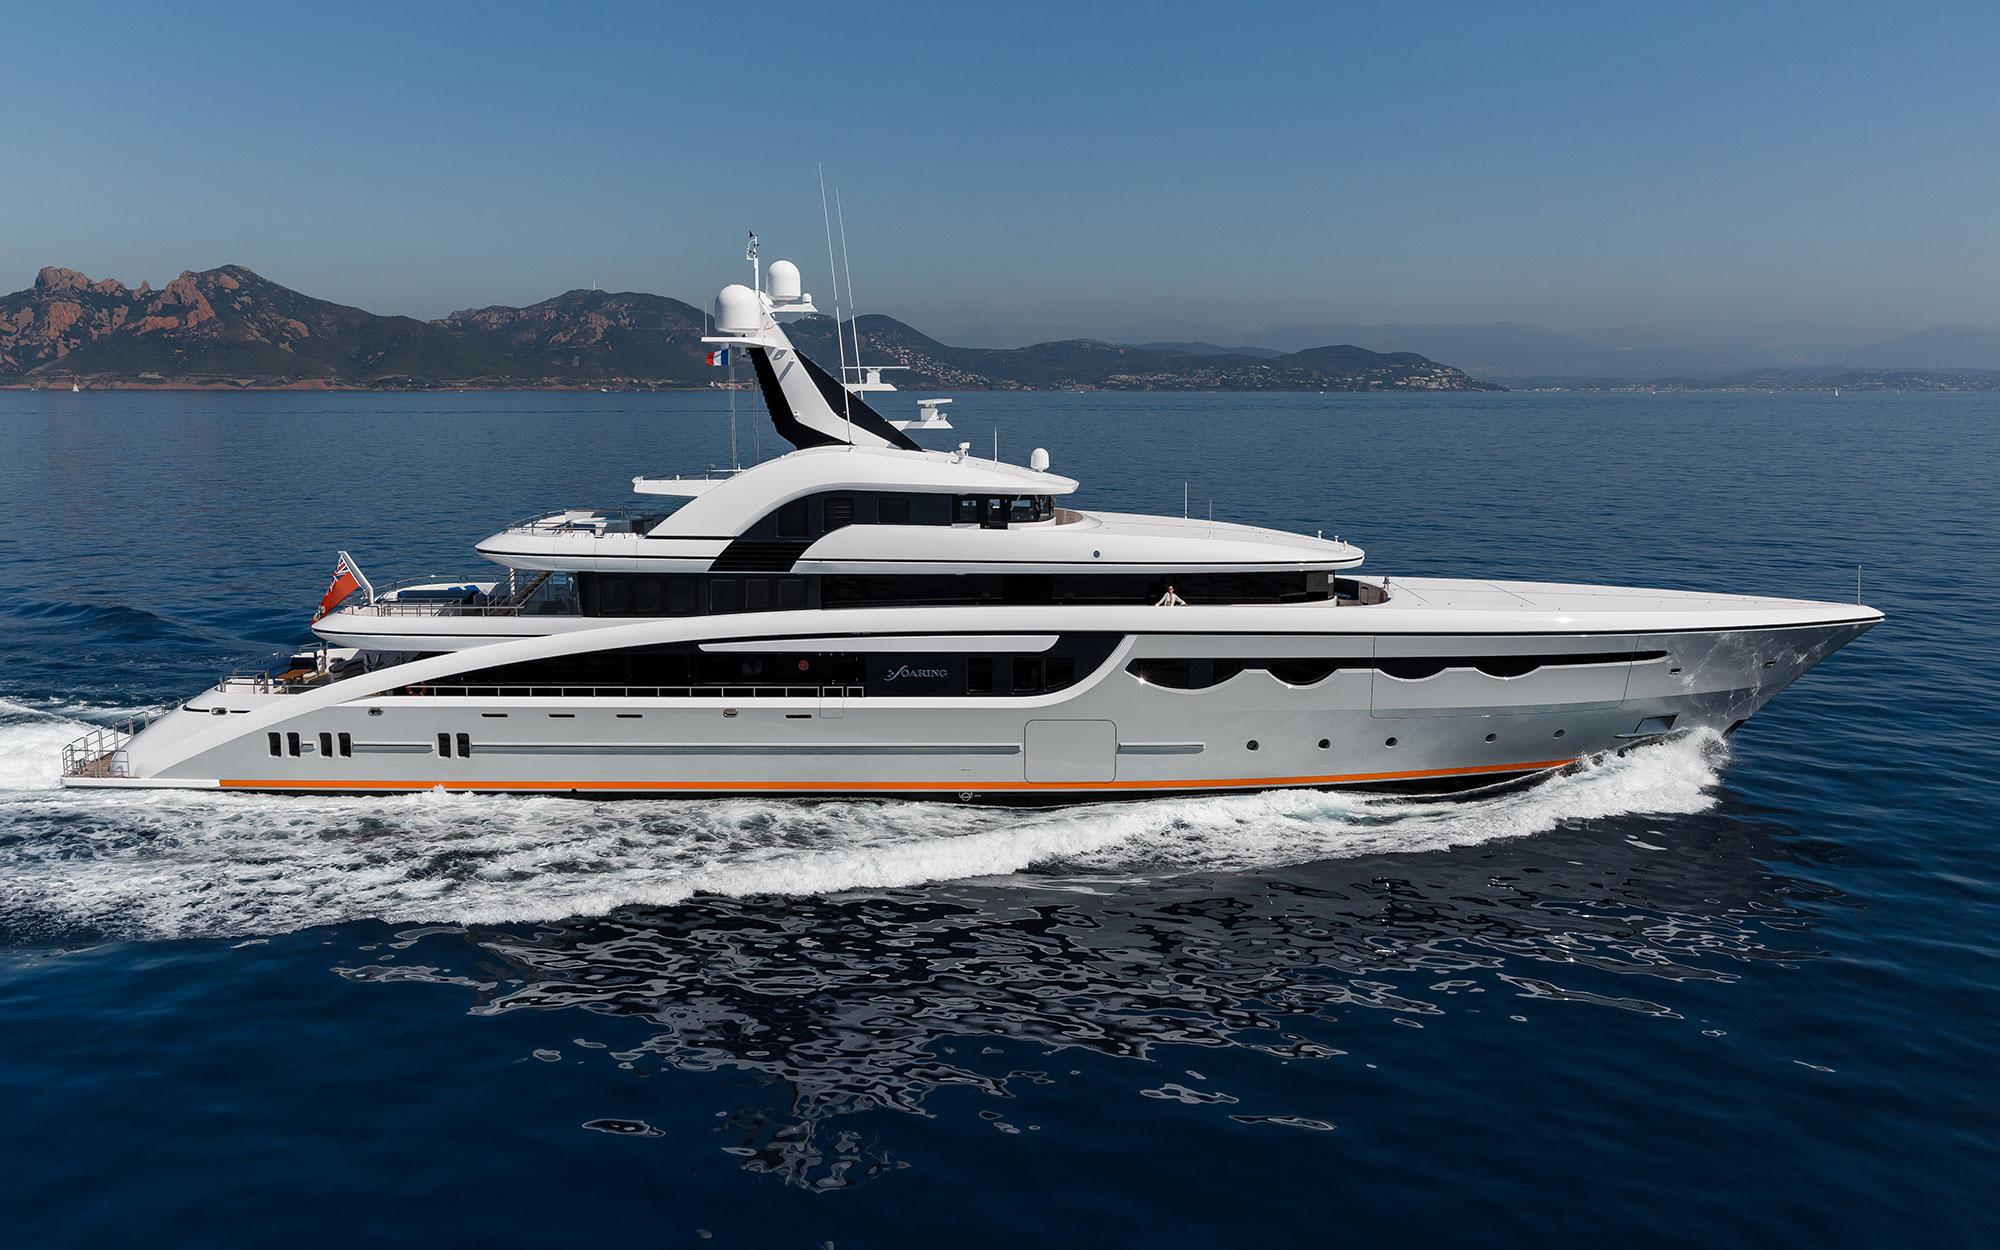 SOARING-yacht-for-sale-01.jpg